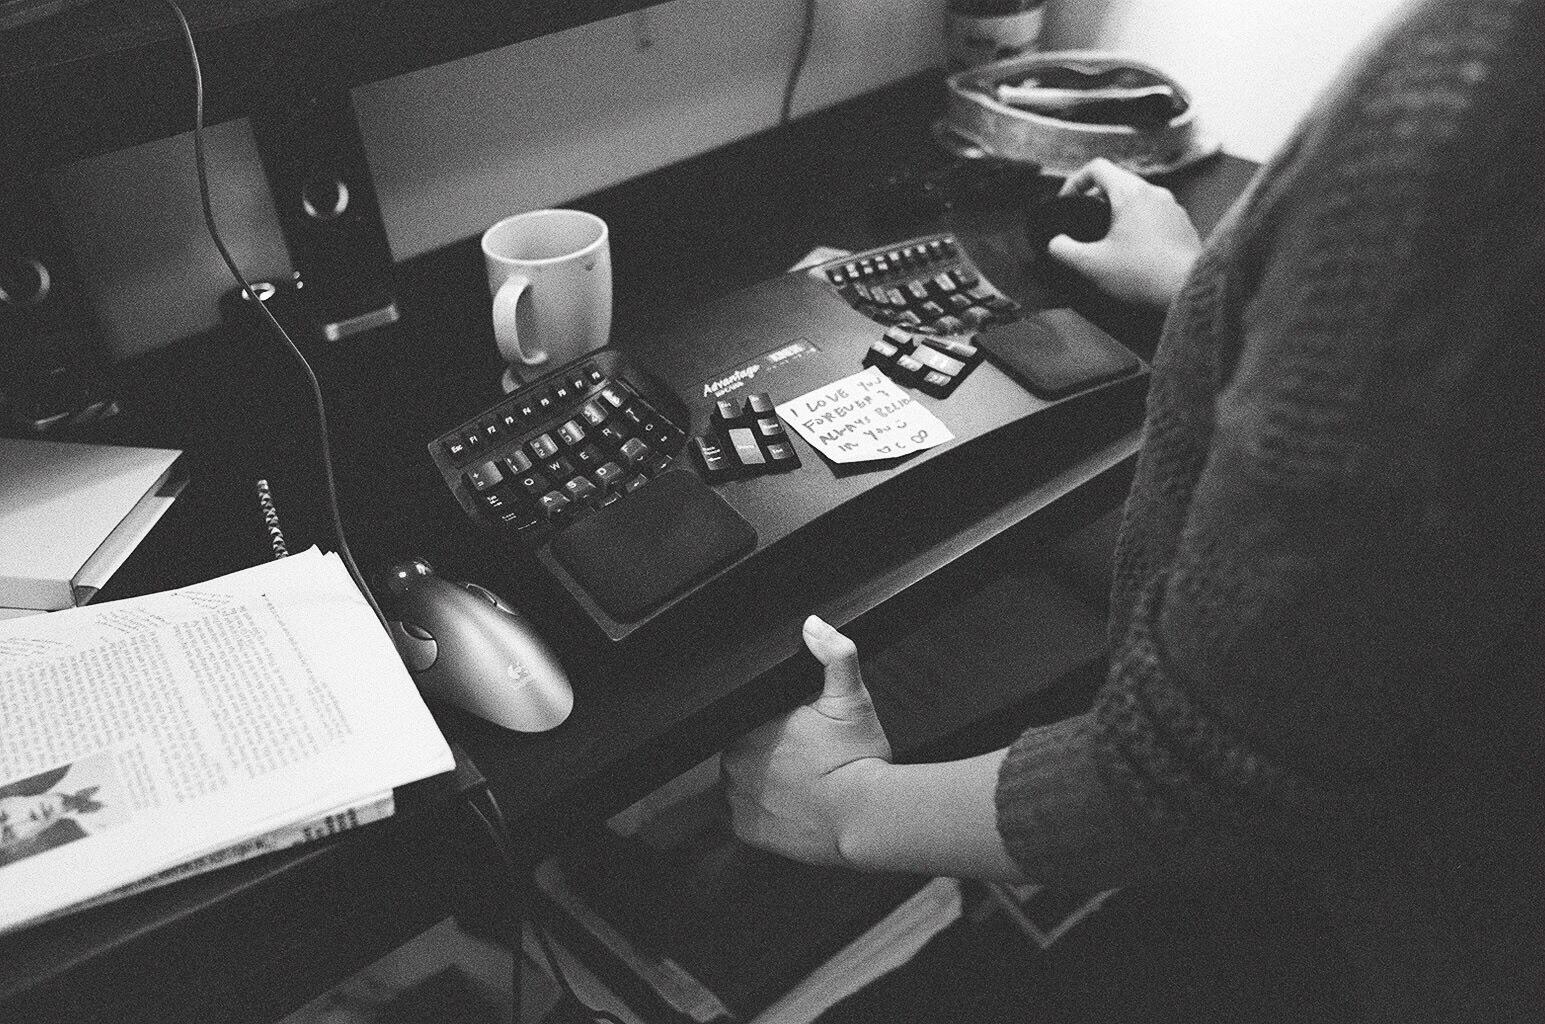 eric kim photography black and white tri x 1600 leica mp 35mm film-1084